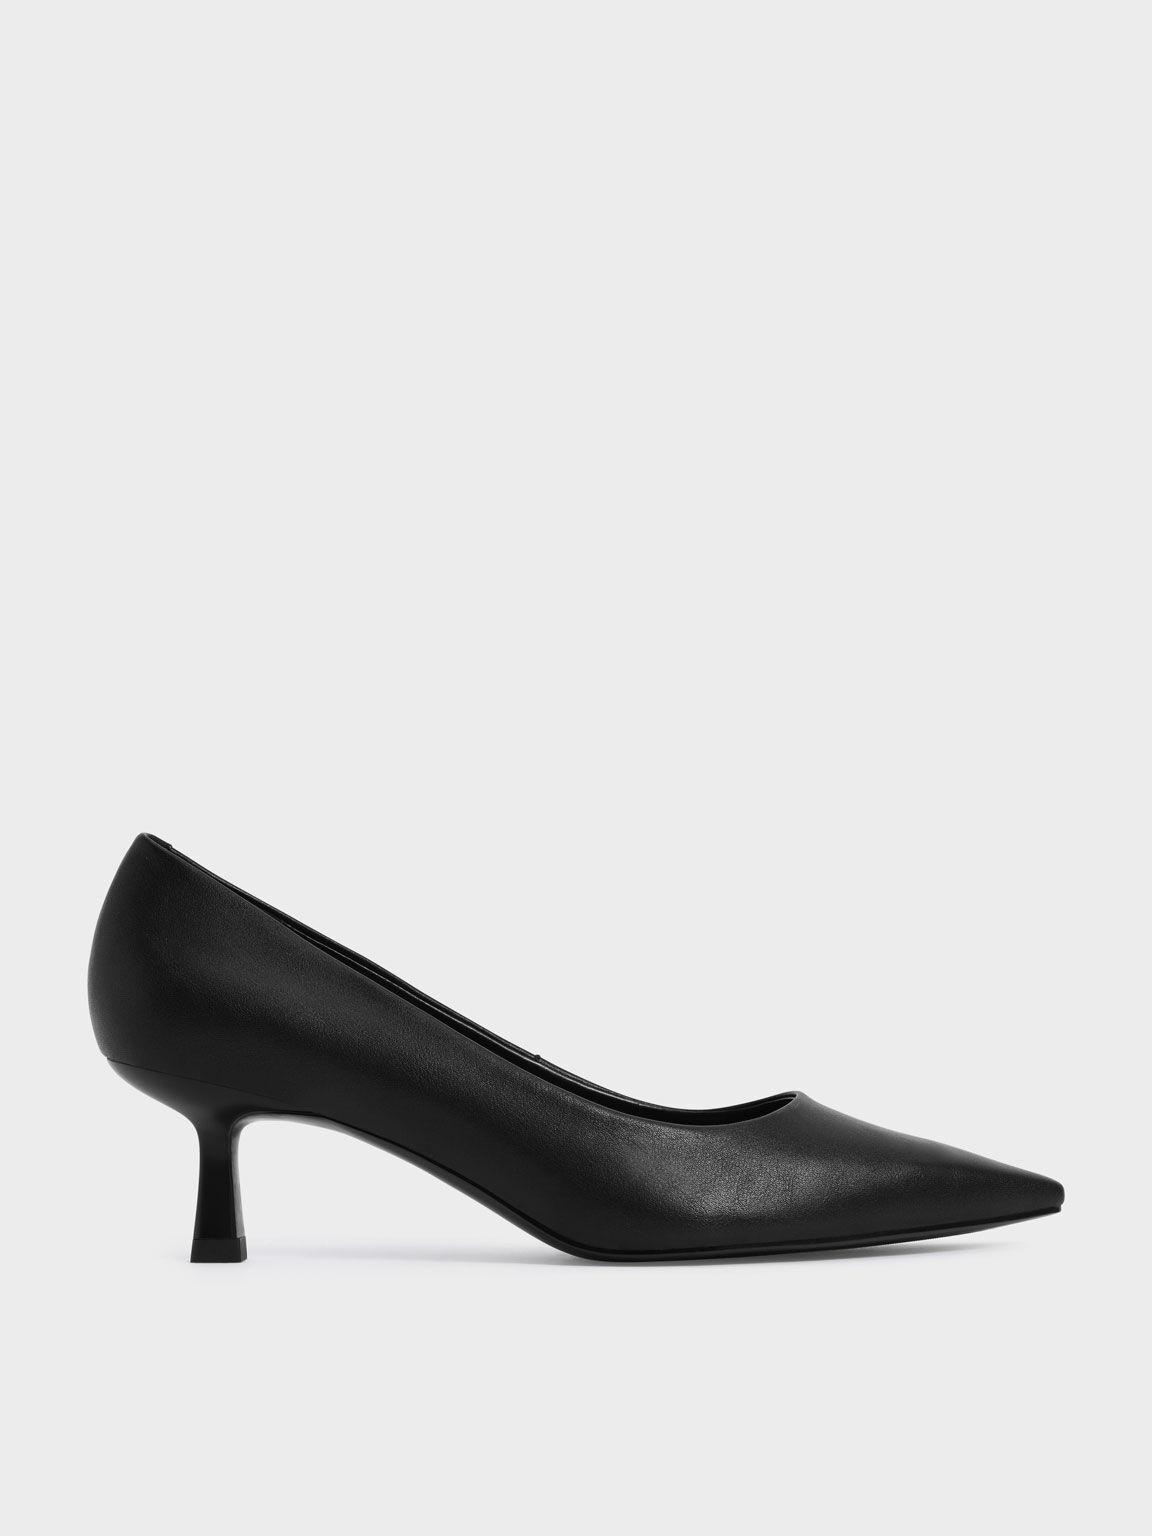 Pointed Kitten Heel Pumps, Black, hi-res